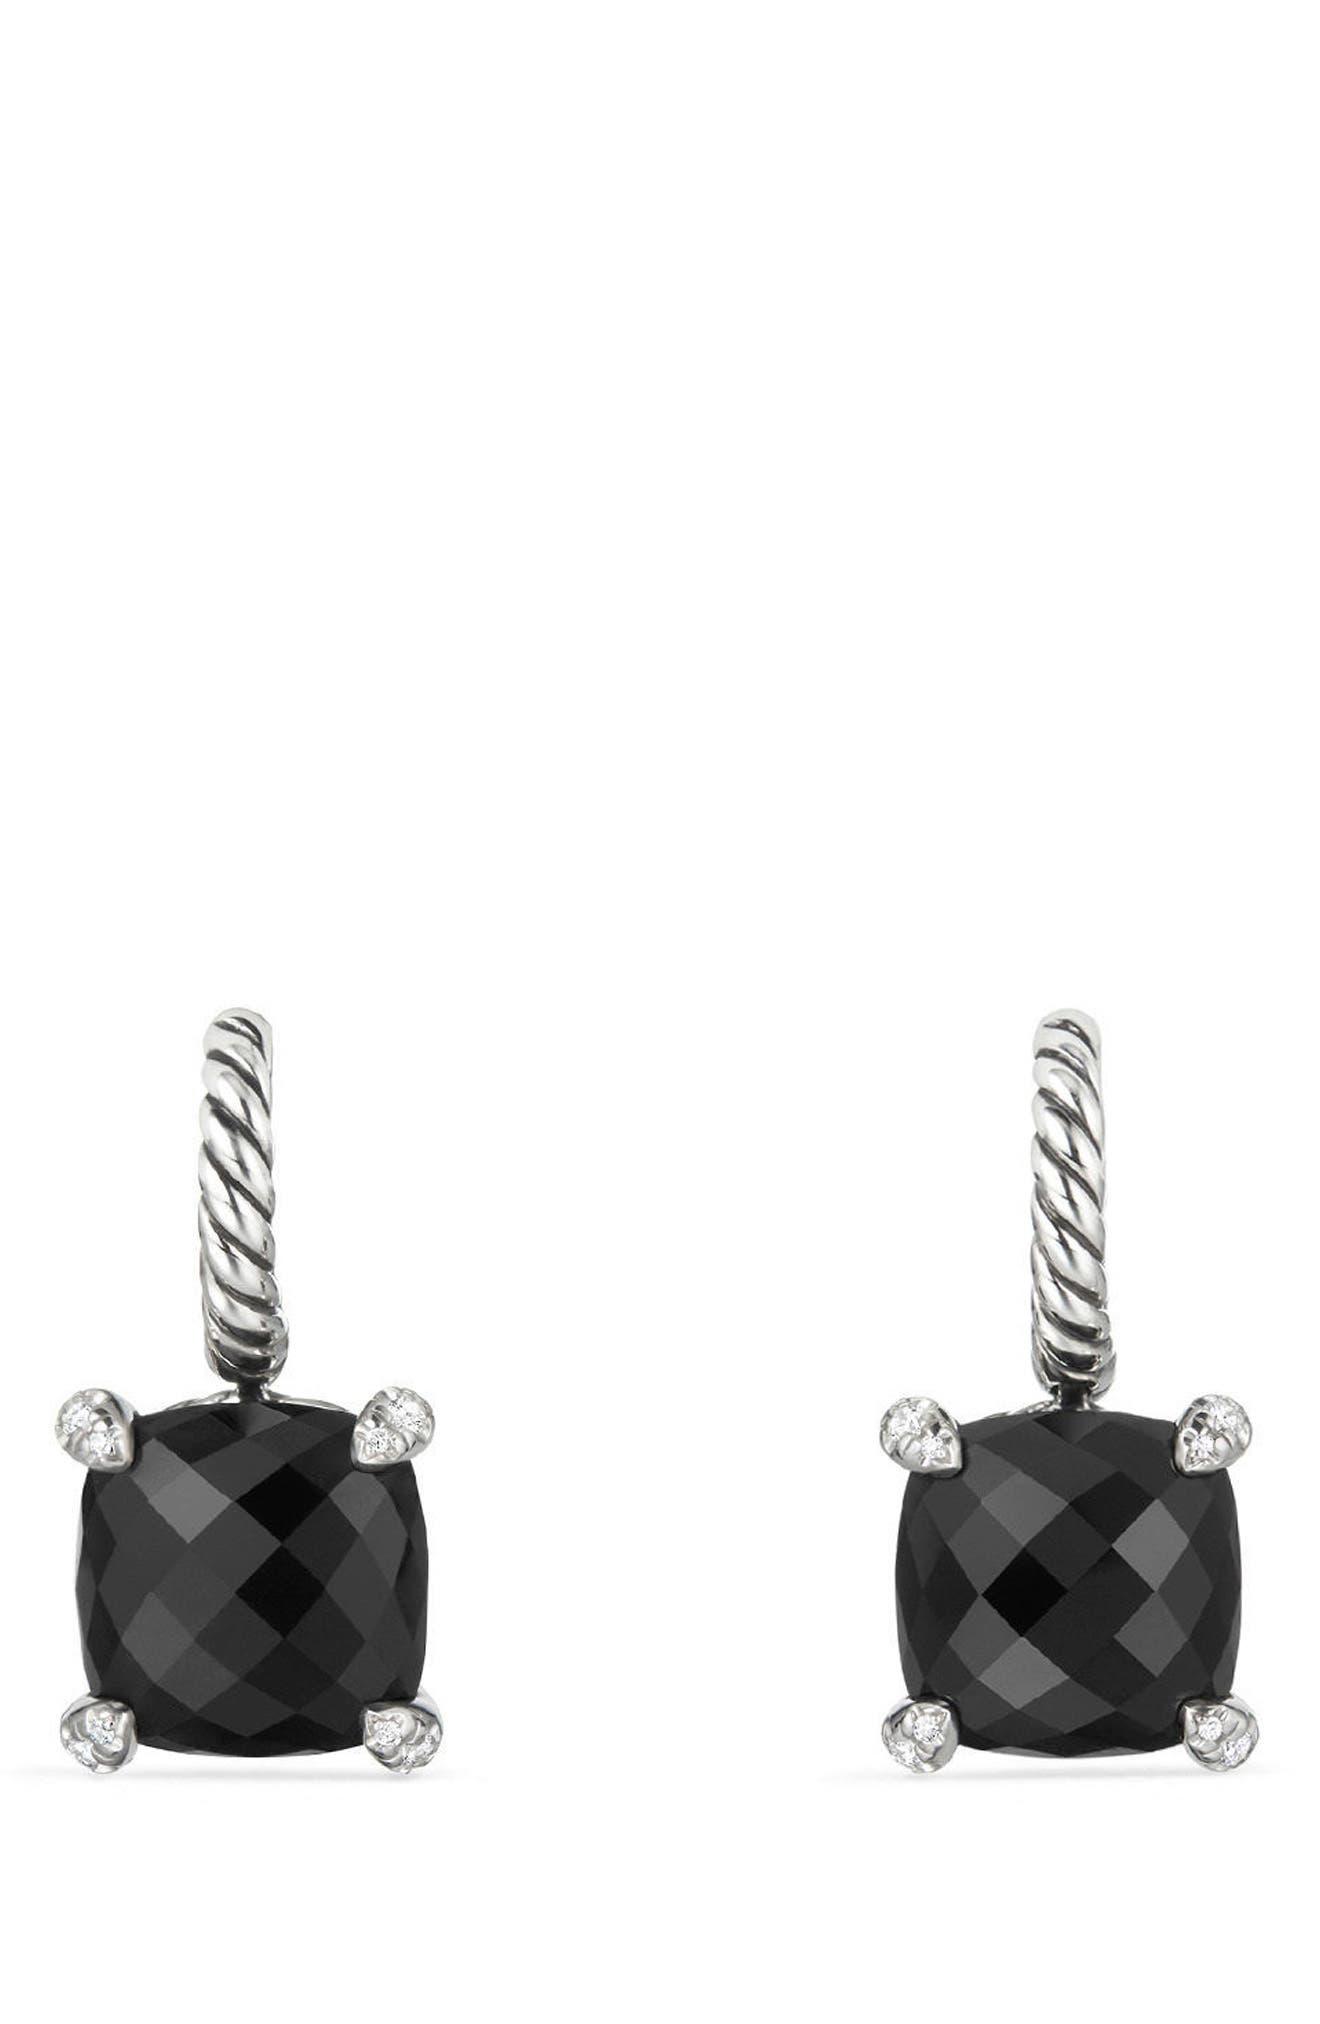 Châtelaine Drop Earrings with Diamonds,                             Main thumbnail 1, color,                             Black Onyx